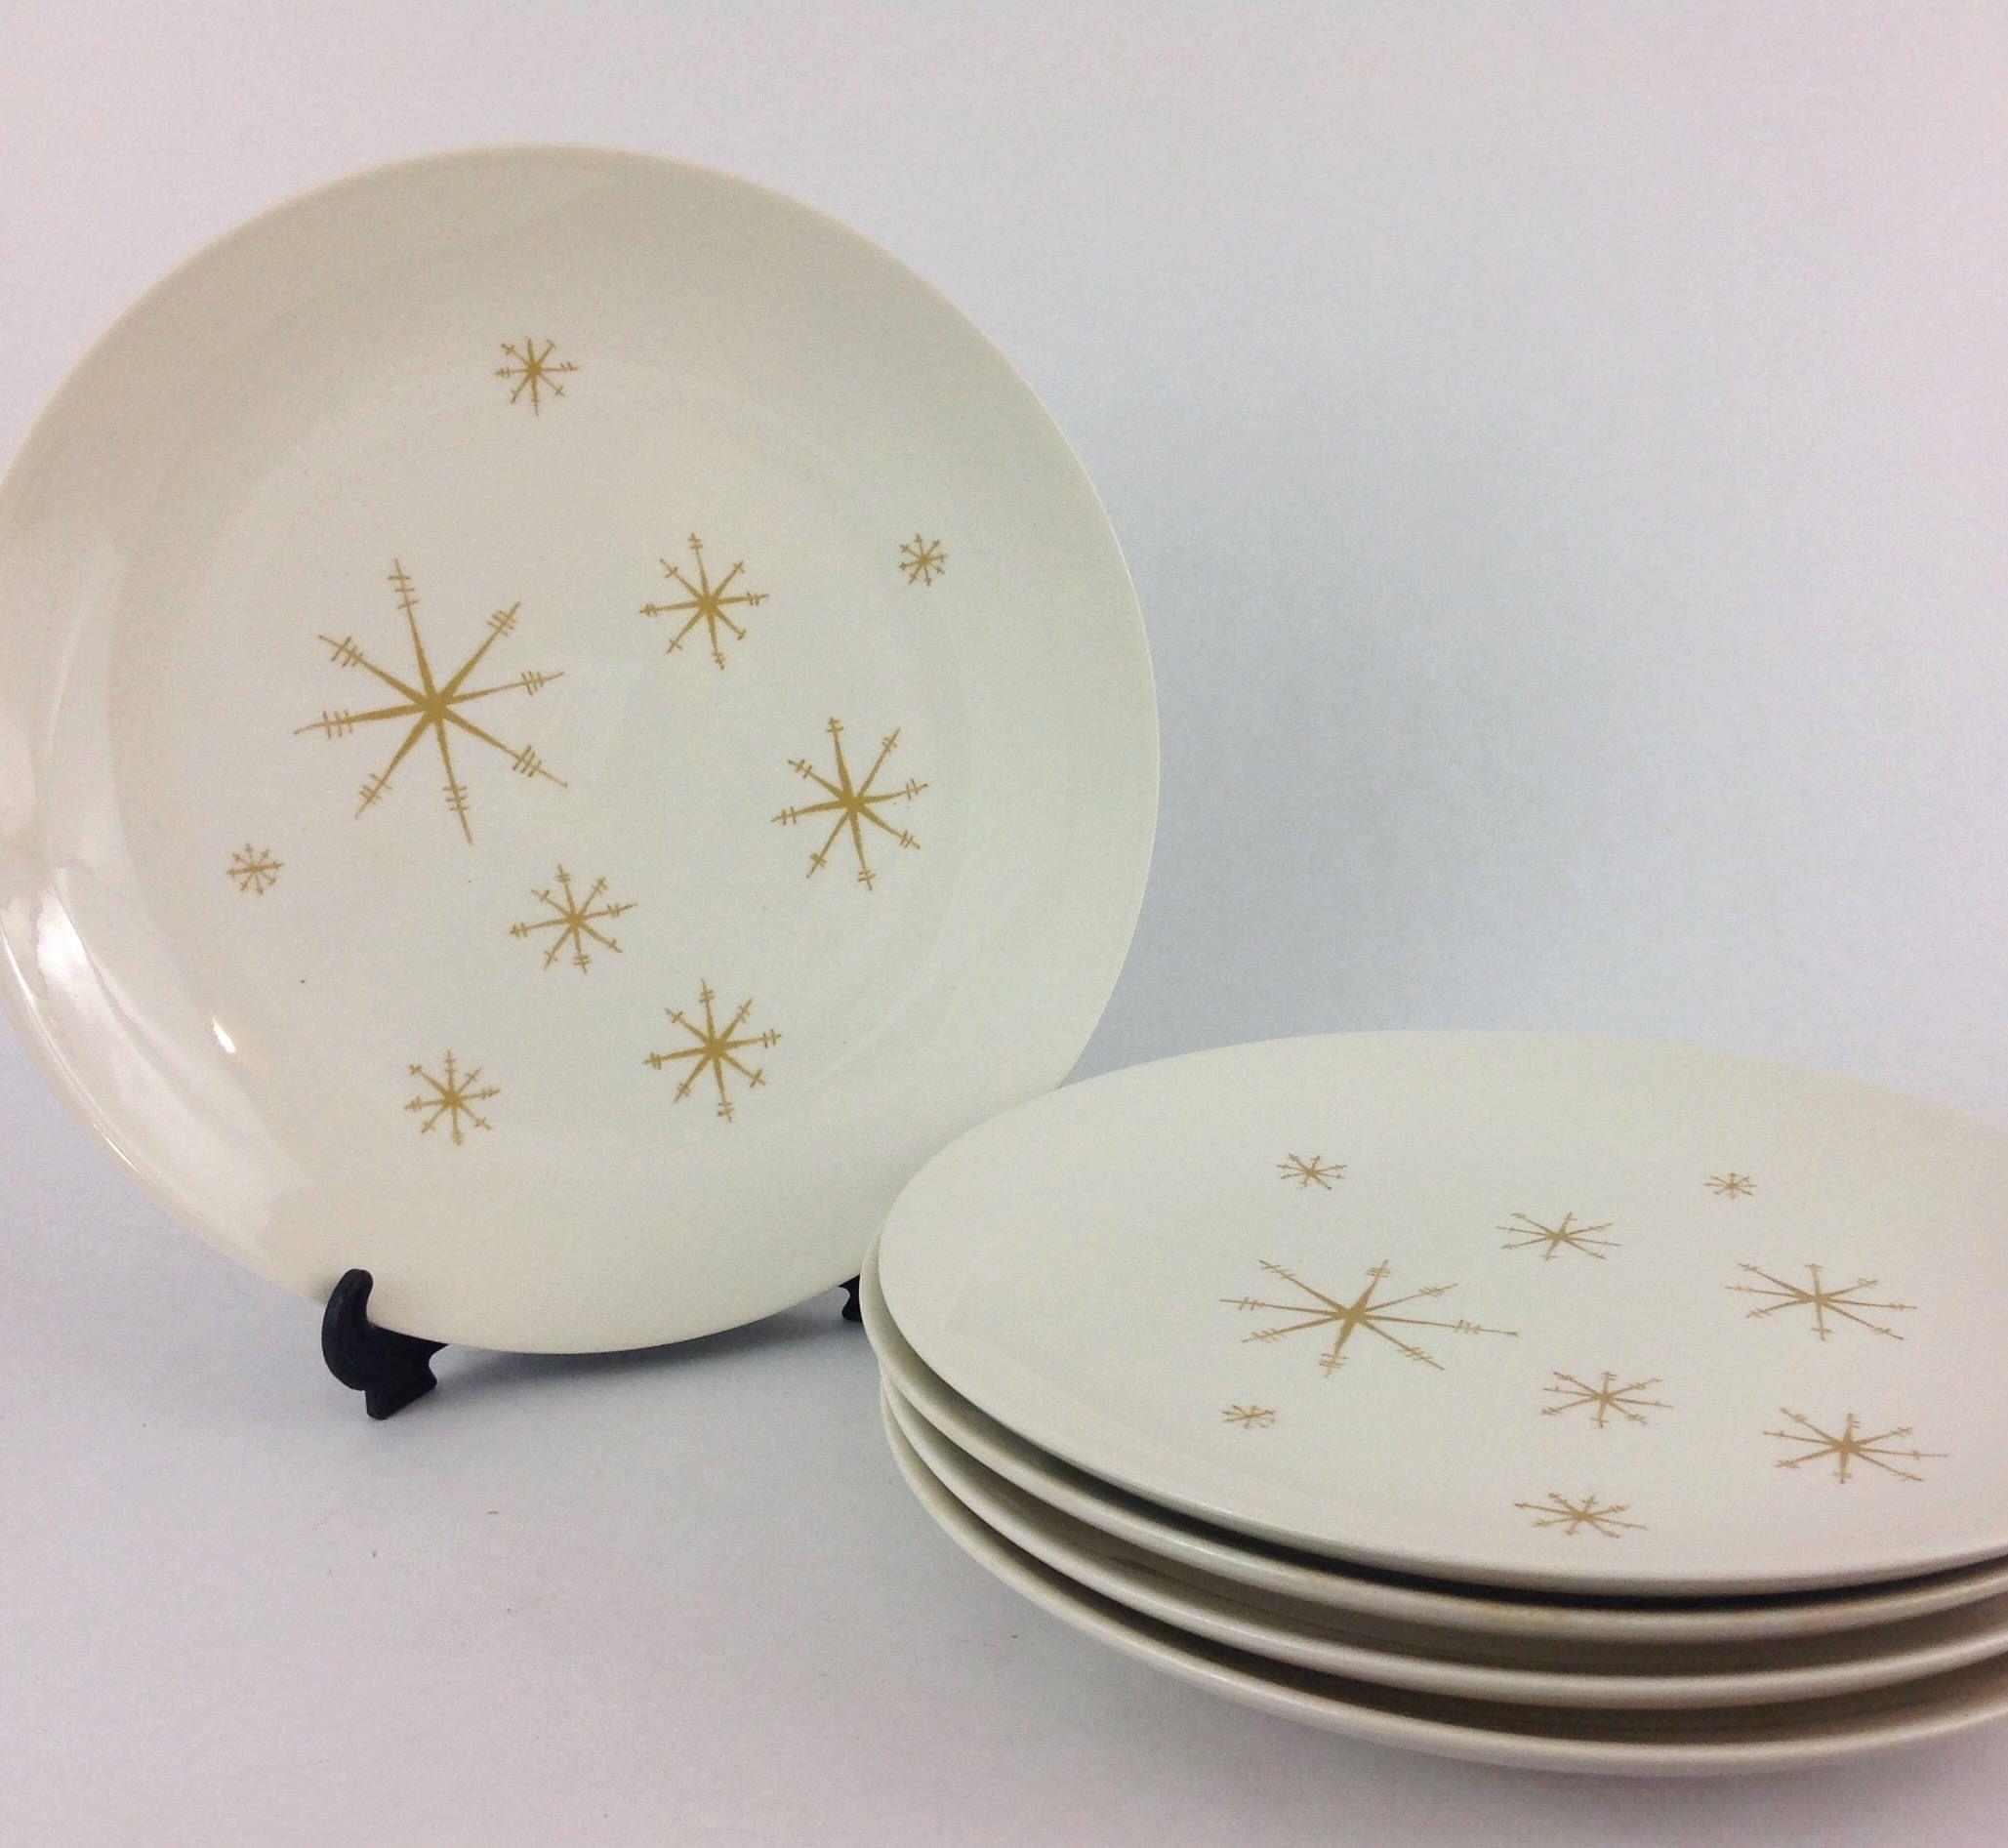 Vintage Royal China Star Glow Dinner Plates Set of 5 Atomic 10  Snowflake Dinnerware Sputnik Retro by LakesideVintageShop on Etsy & Vintage Royal China Star Glow Dinner Plates Set of 5 Atomic 10 ...